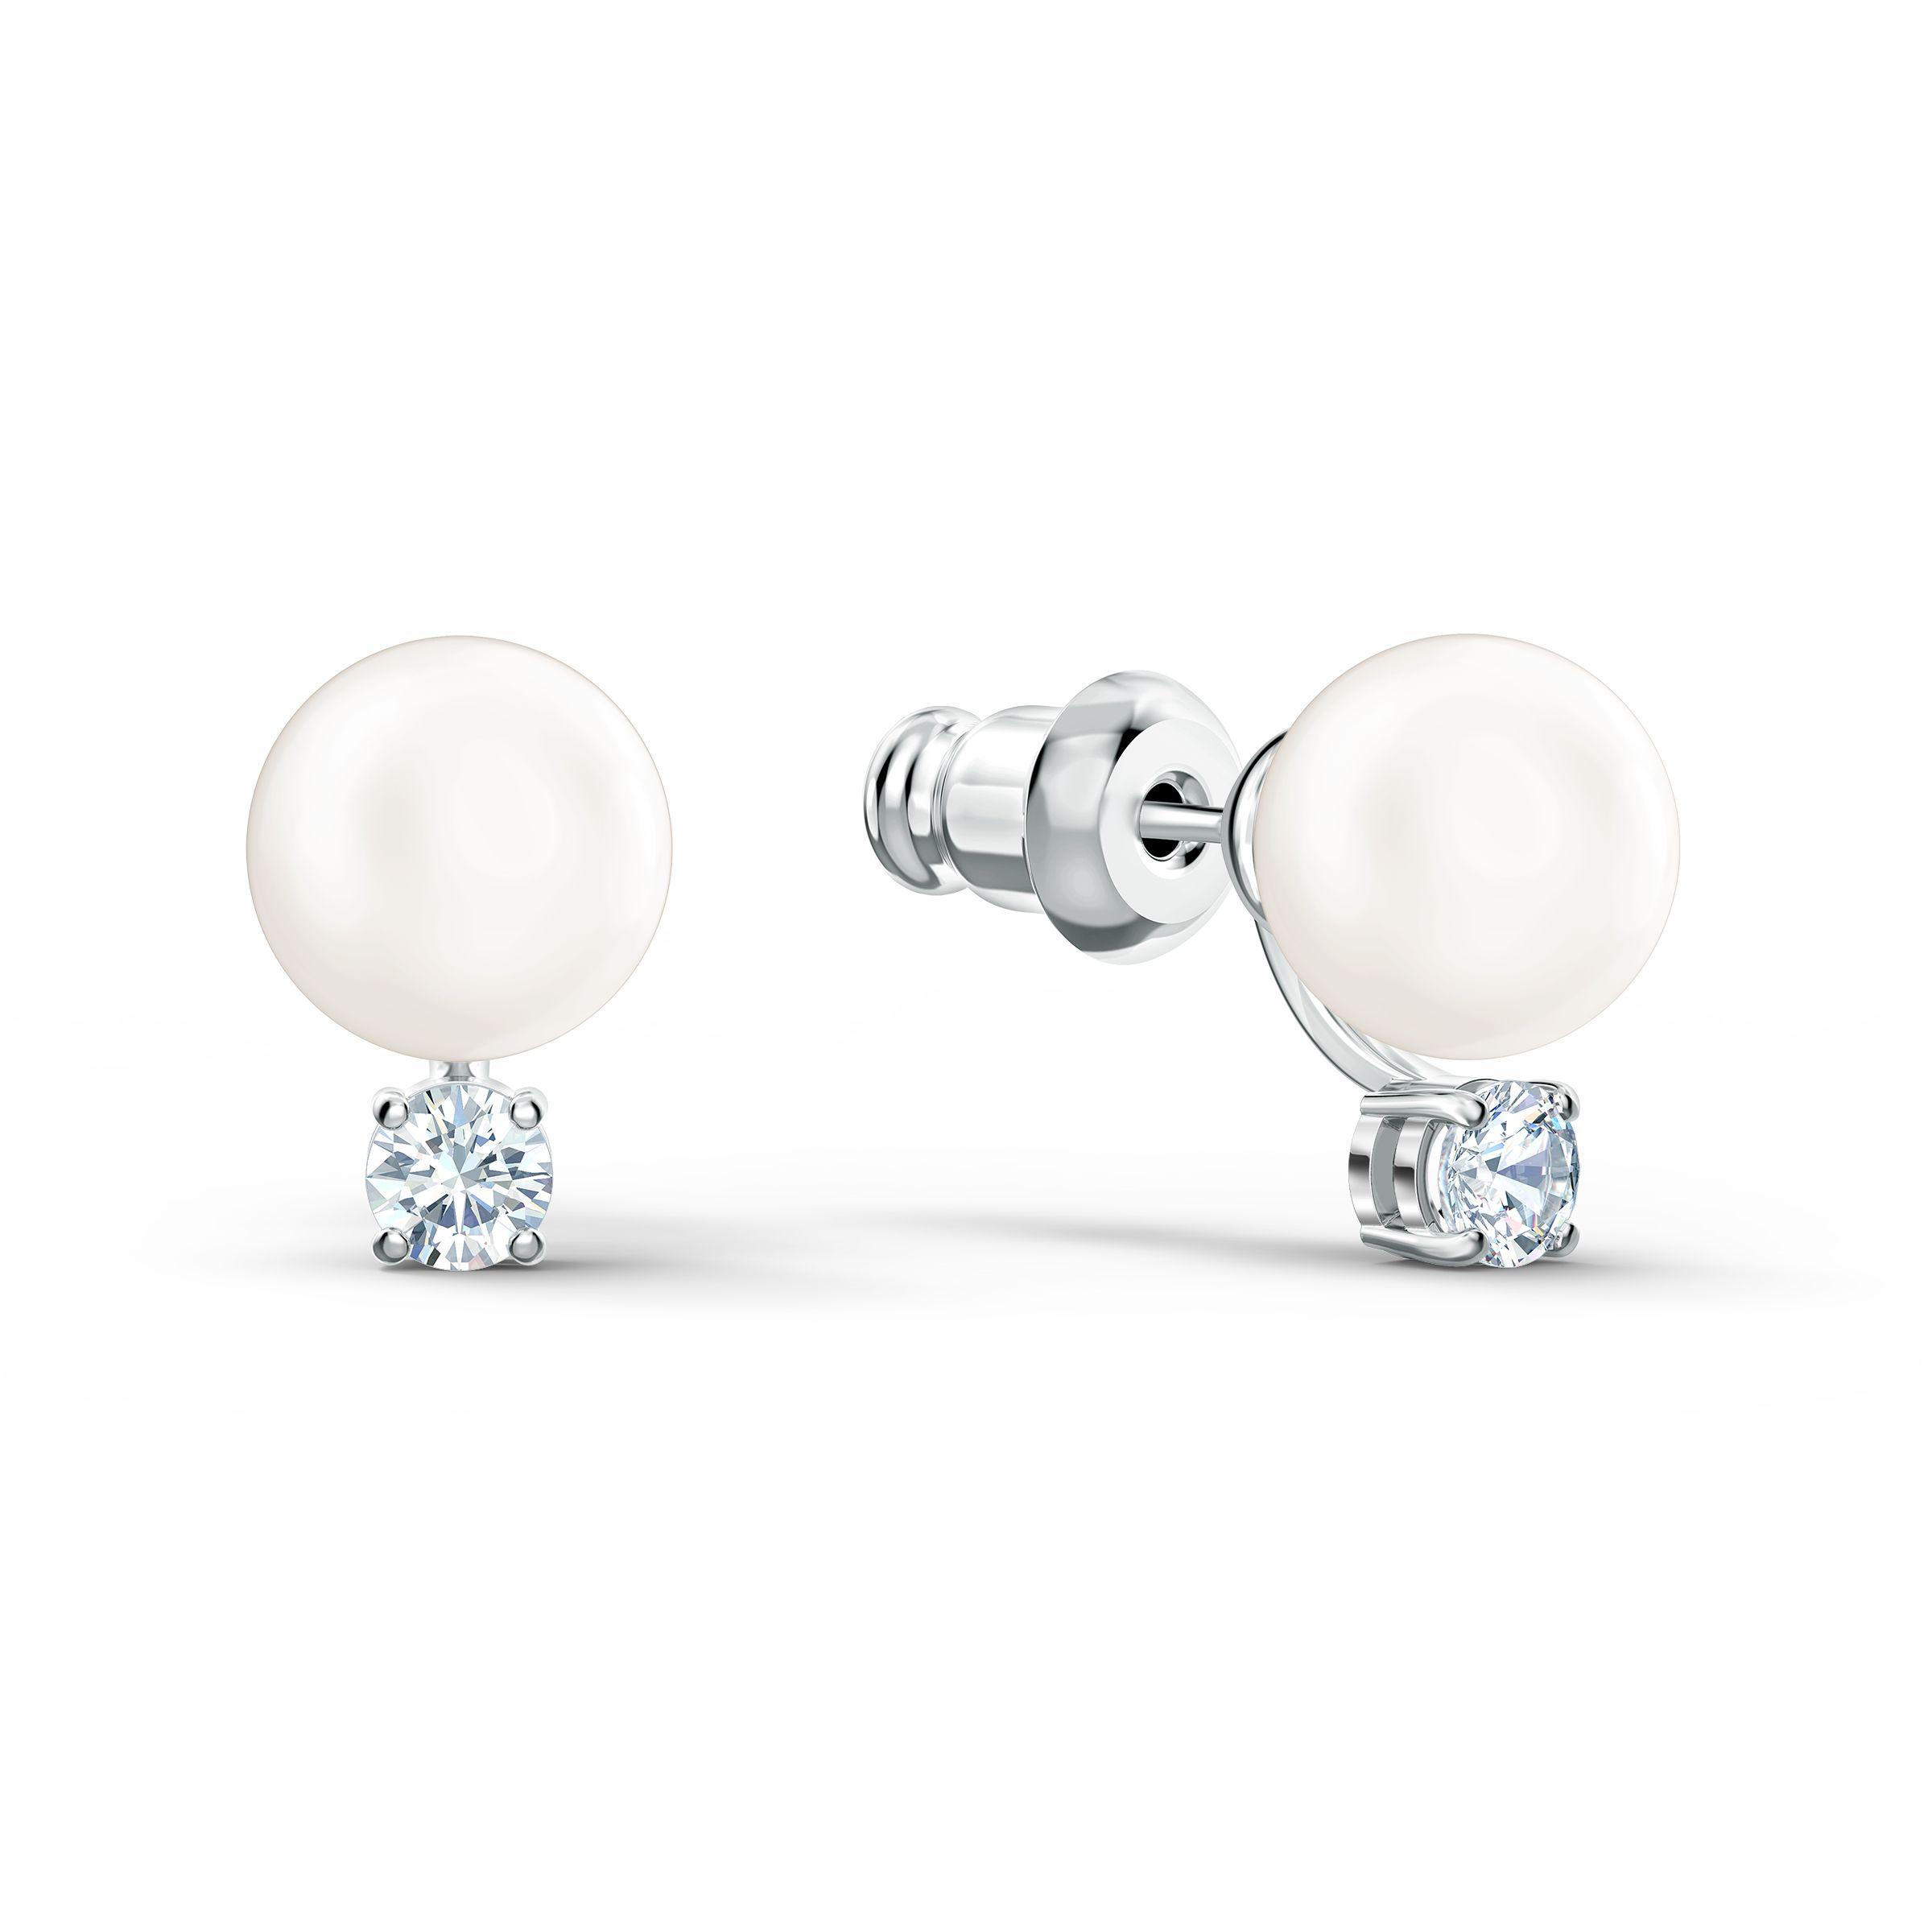 Boucles d'oreilles Treasure Pearl, blanc, métal rhodié, Swarovski